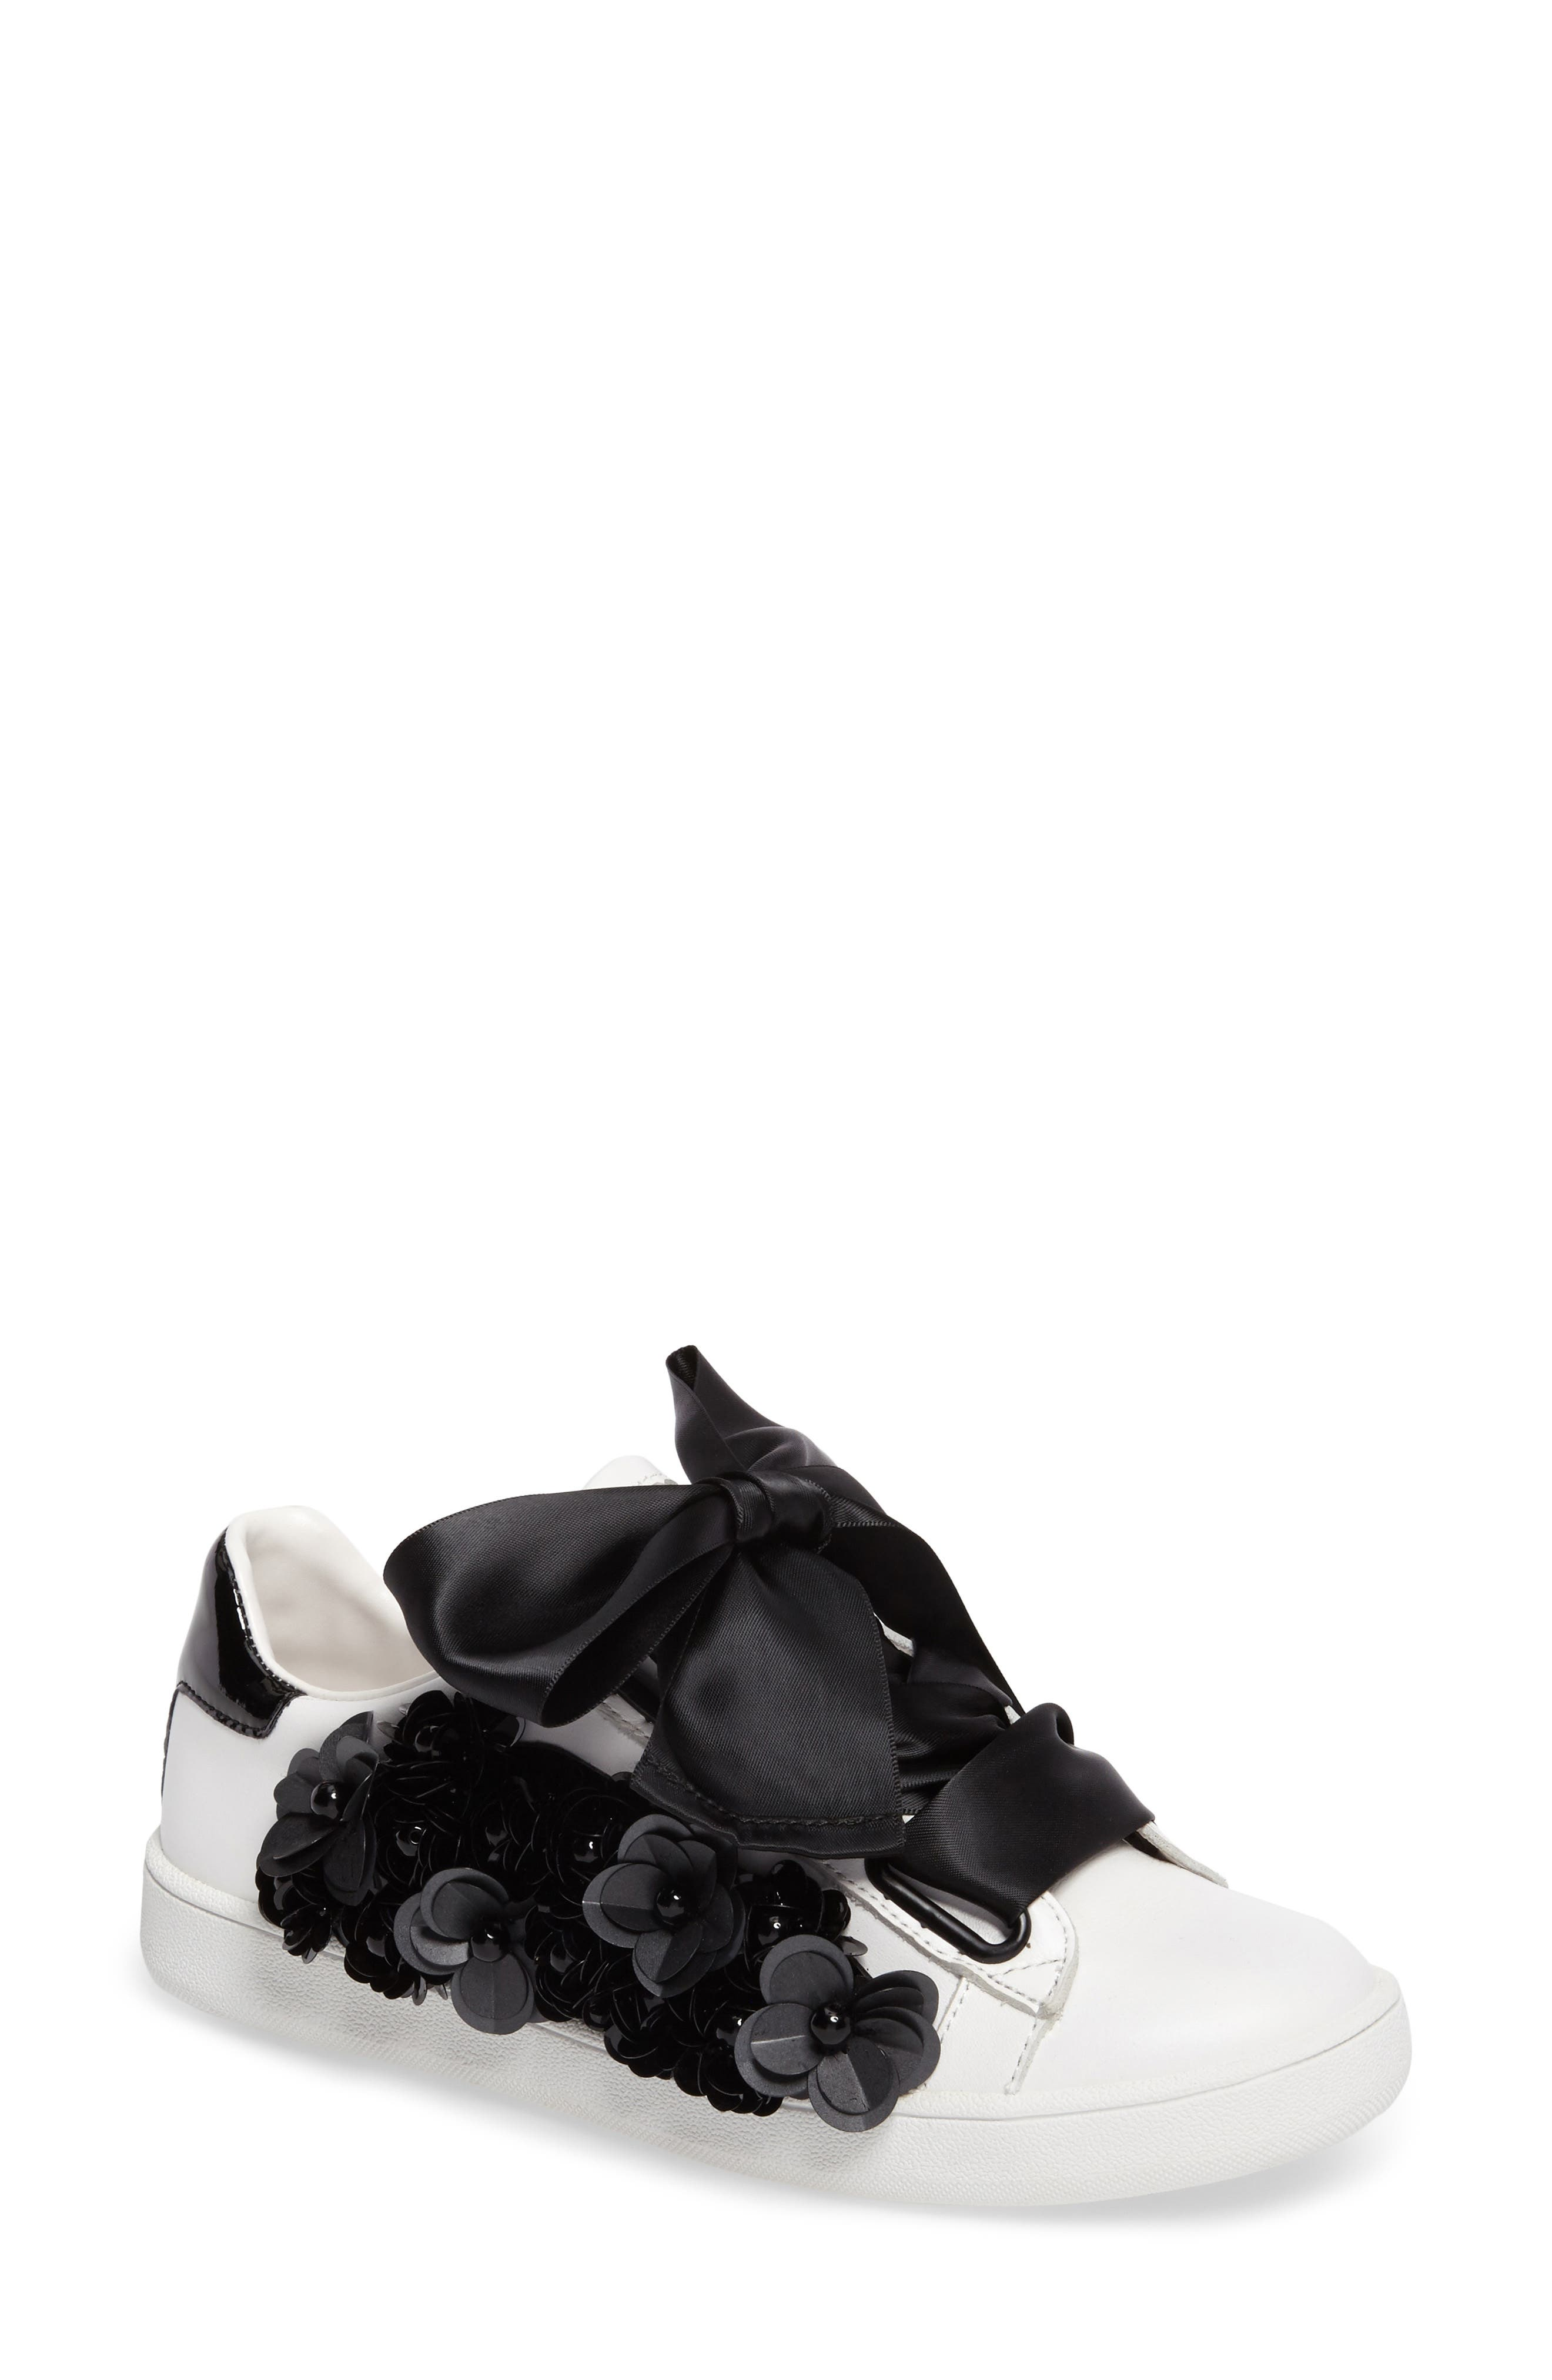 Pabst Low-Top Sneaker,                             Main thumbnail 2, color,